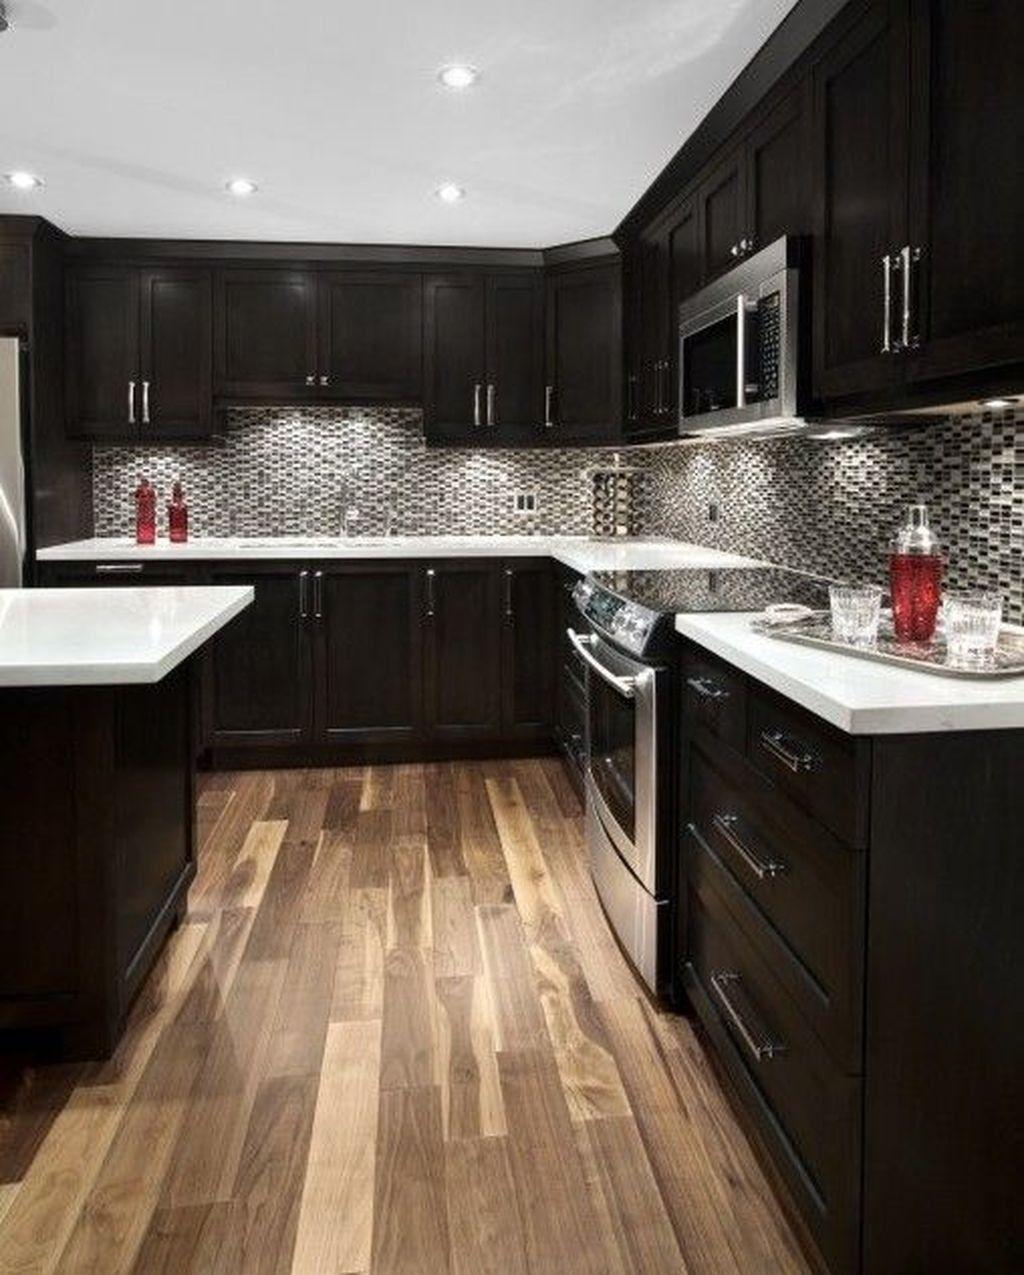 20 Cool Kitchen Color Scheme Ideas For Dark Cabinets Kitchens Kitchencolors Kitchenideas Design Cabinet Remodel